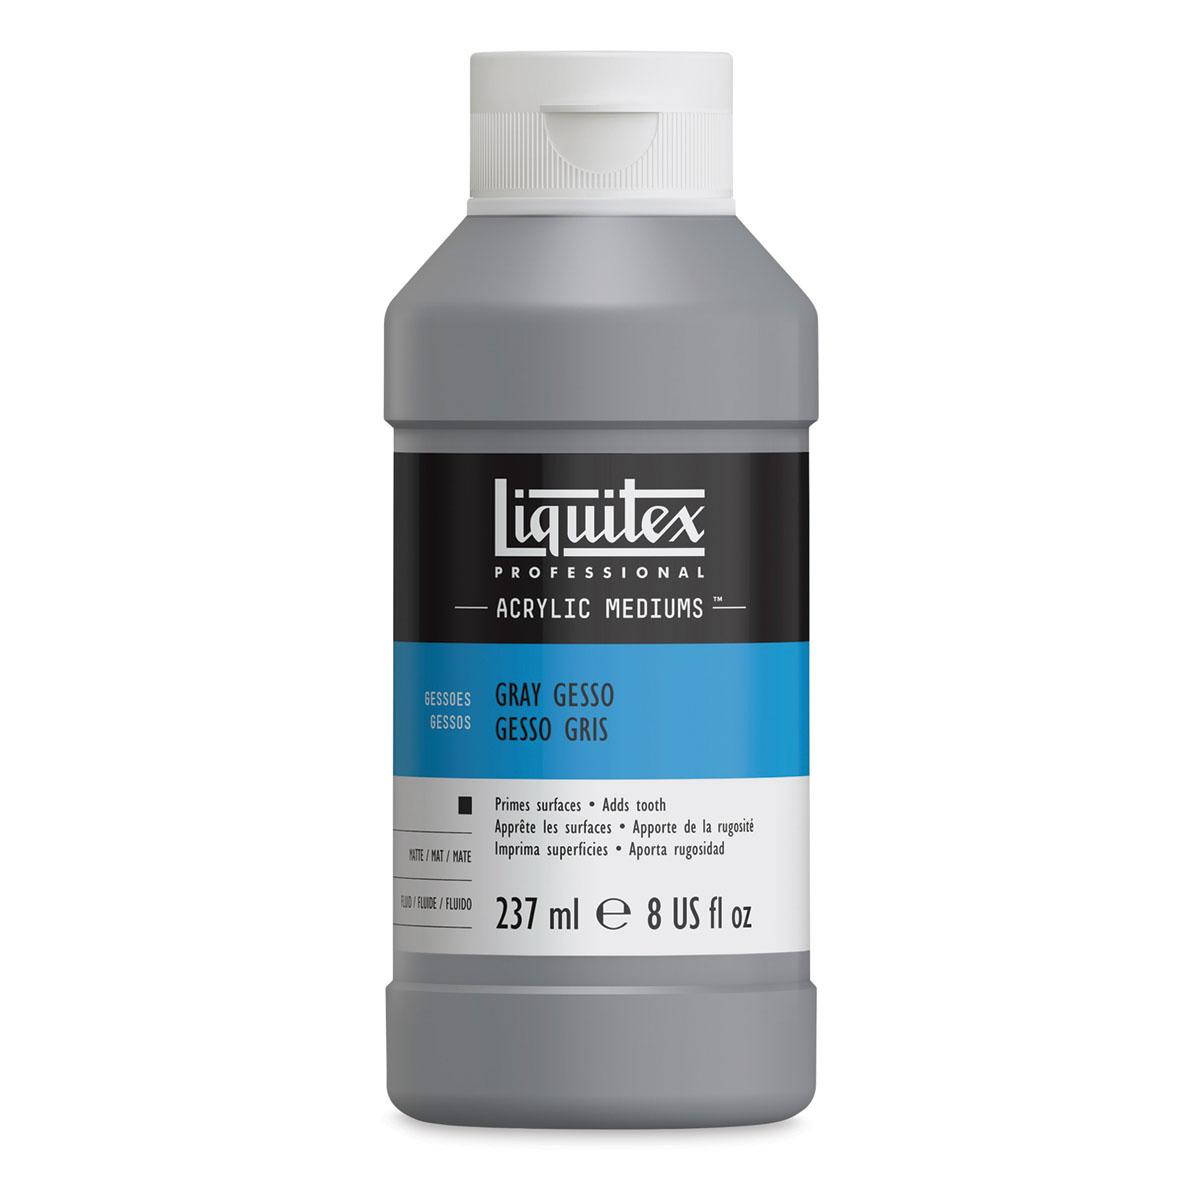 Liquitex Acrylic Gesso - Neutral Gray, 8 oz bottle